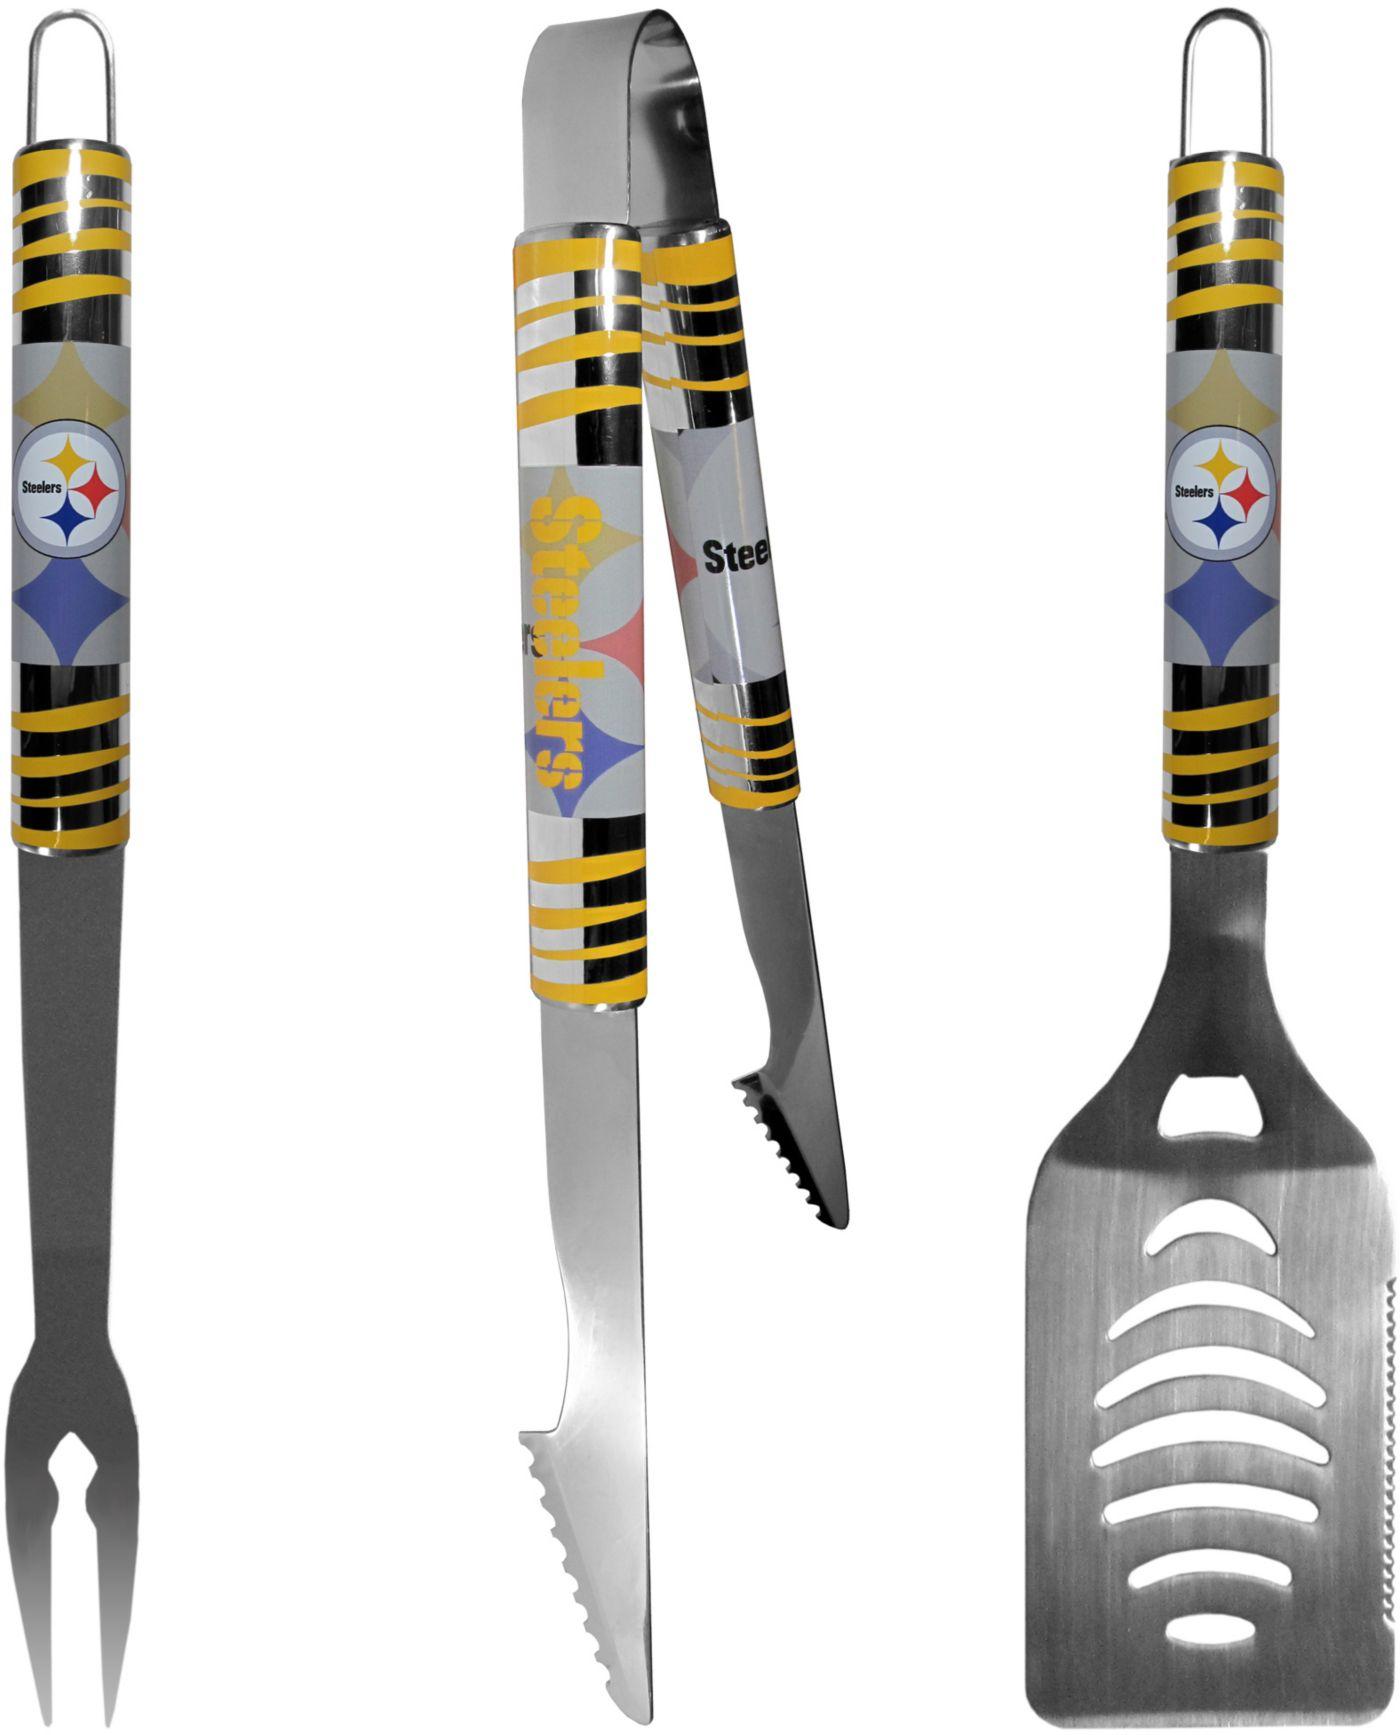 Siskiyou Pittsburgh Steelers 3-Piece BBQ Tailgate Set